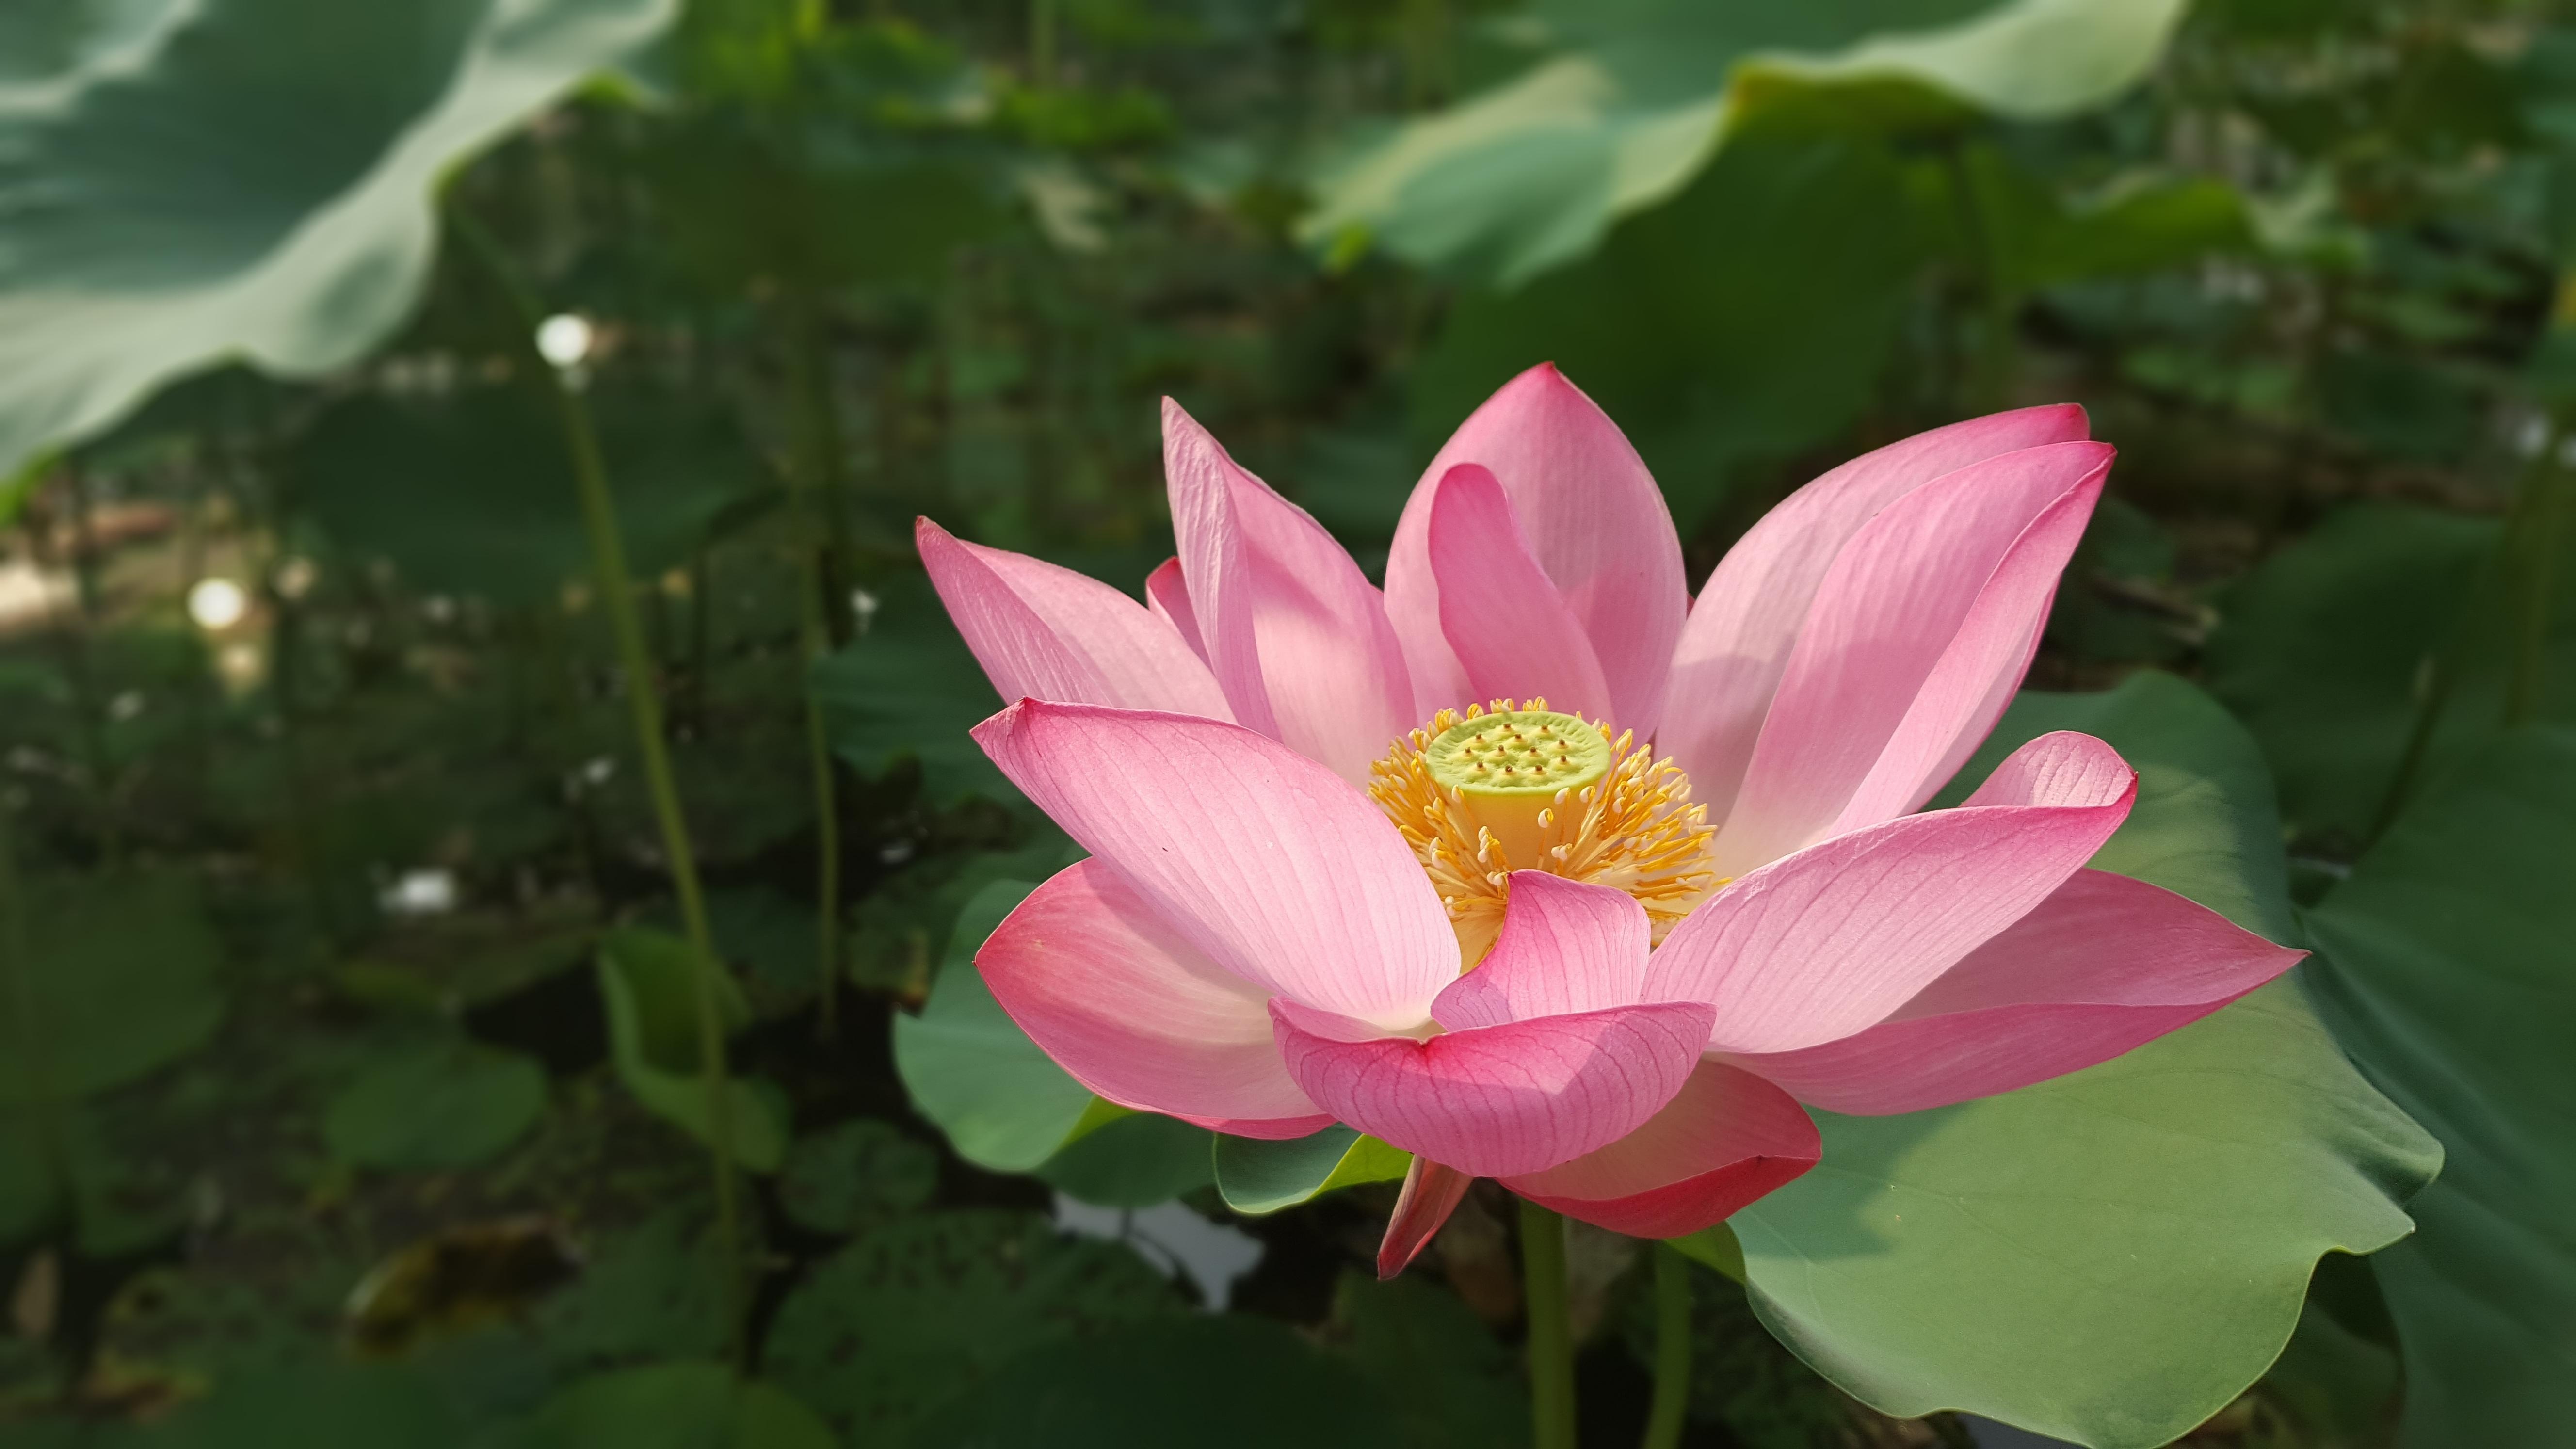 Images Gratuites Fleurs Fleur Lotus Nelumbo Nucifera Lotus